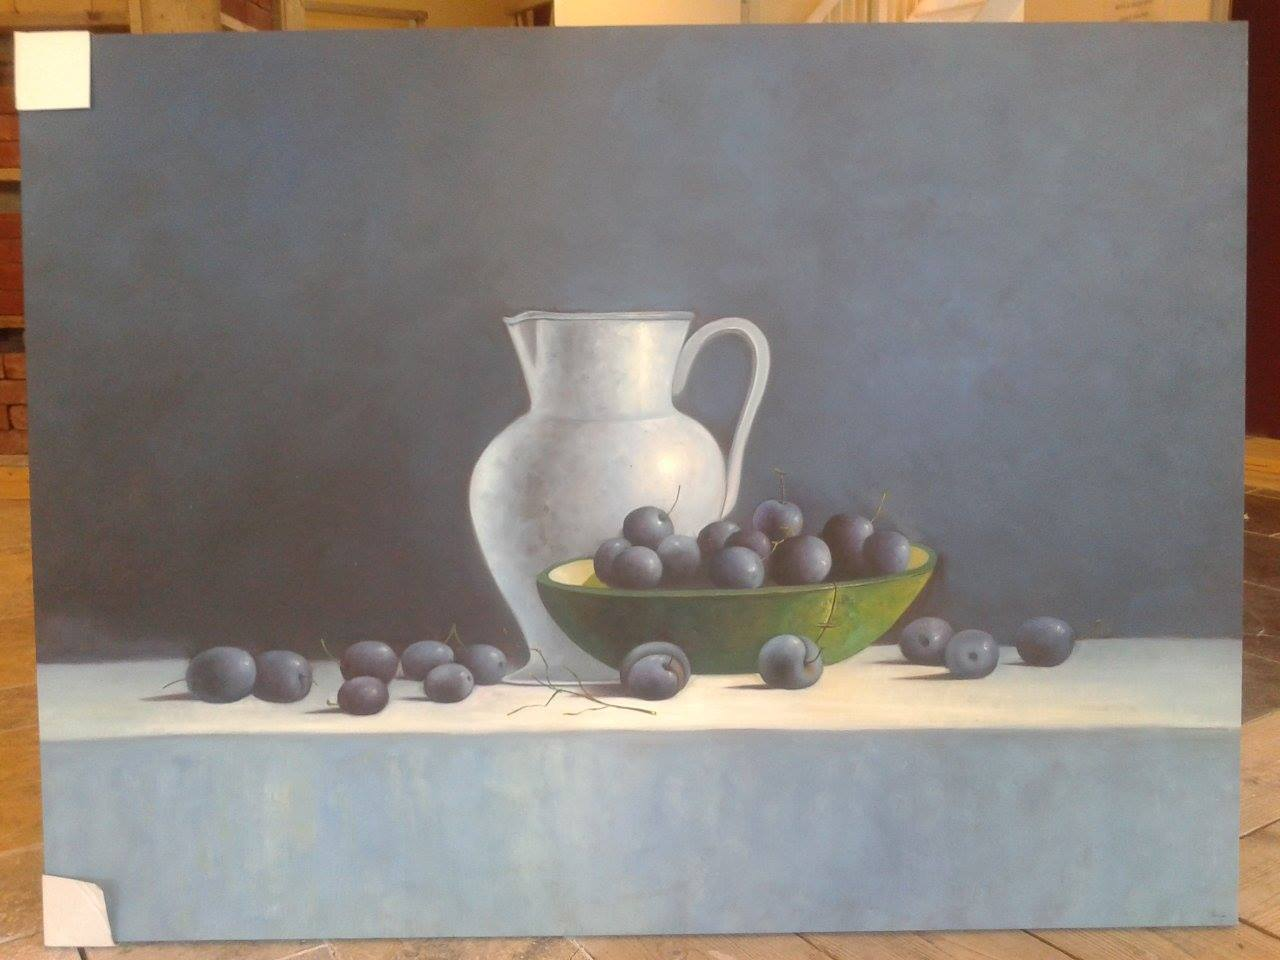 Canvas schilderij stilleven 2 90x120x0 - Decoratie schilderij wc ...